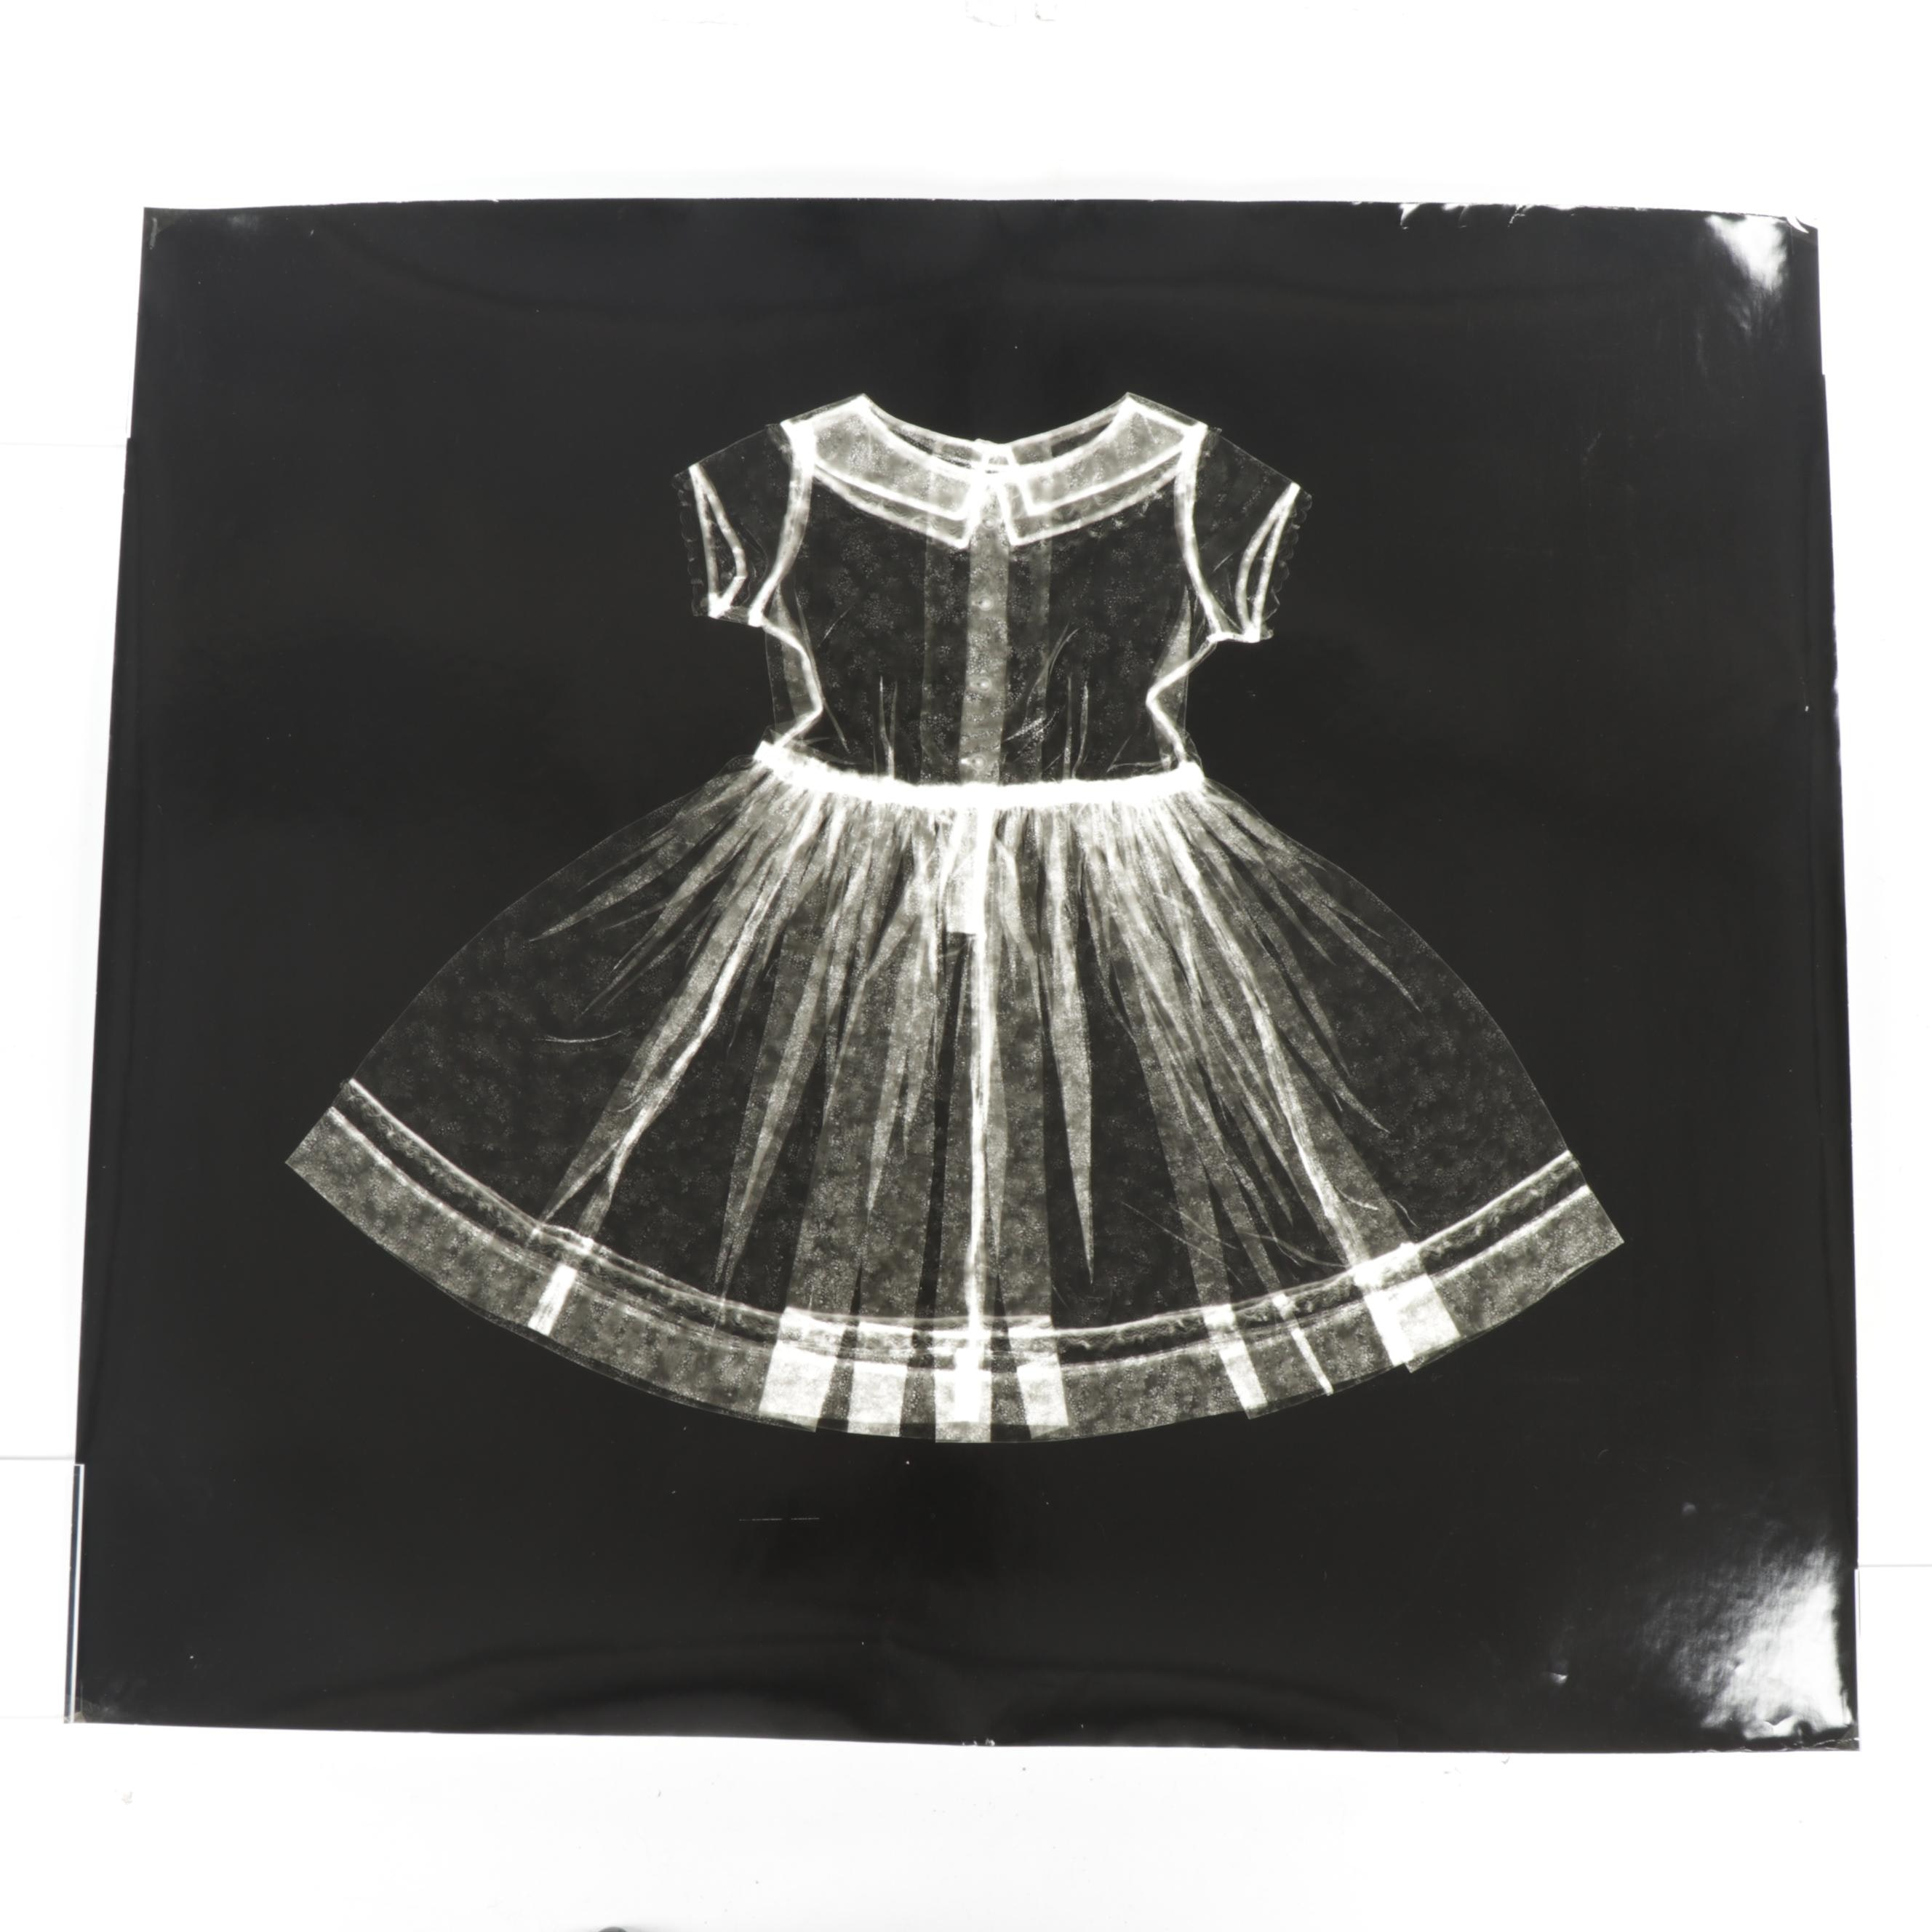 Karen Savage Life-Size Photogram of a Child's Dress